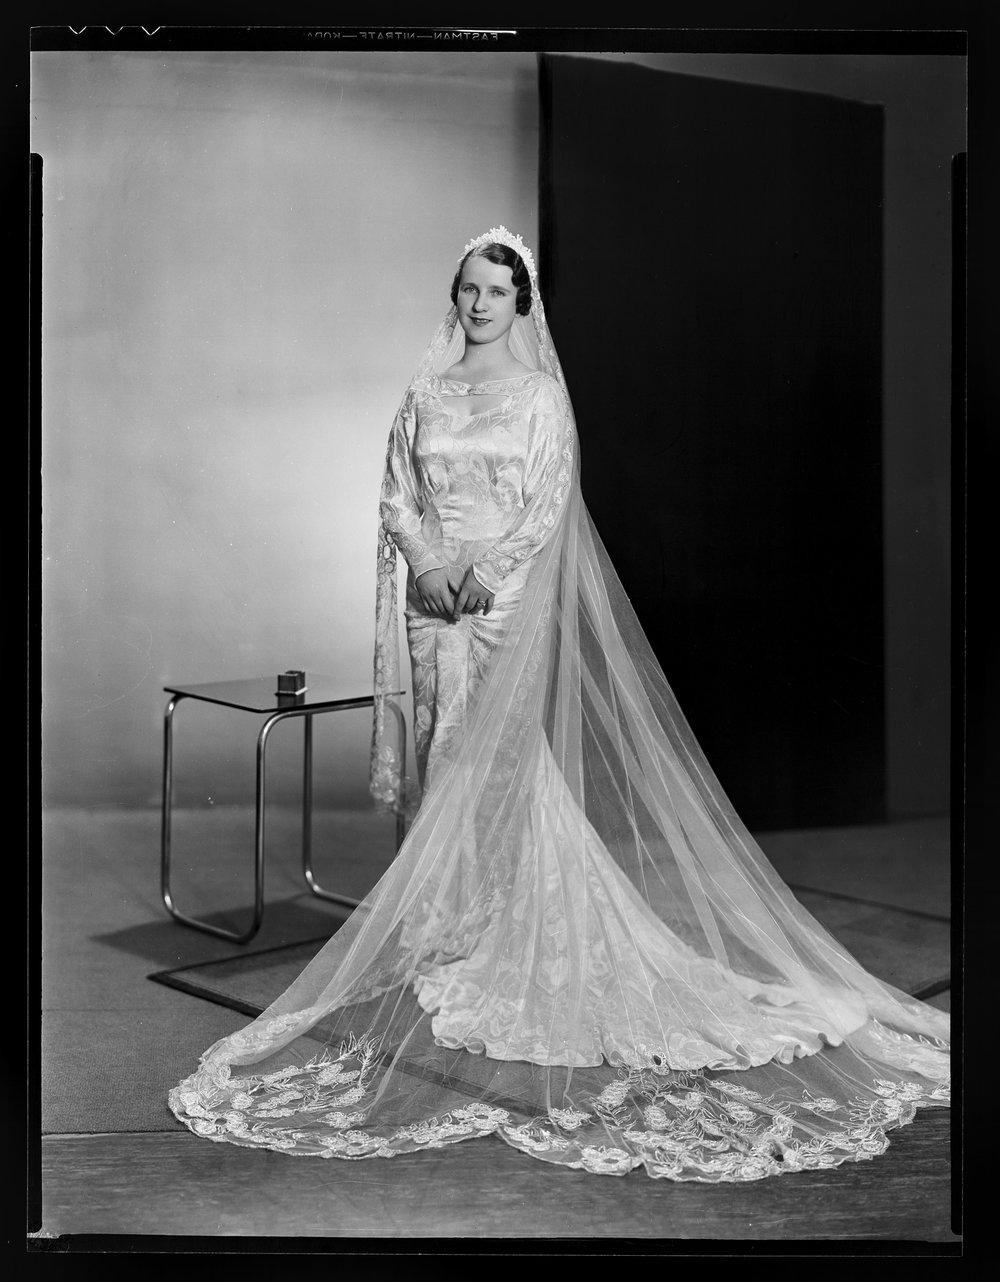 Museum of New Zealand: Mrs AJ Jeavons Wedding, Spencer Digby Studios, 1936